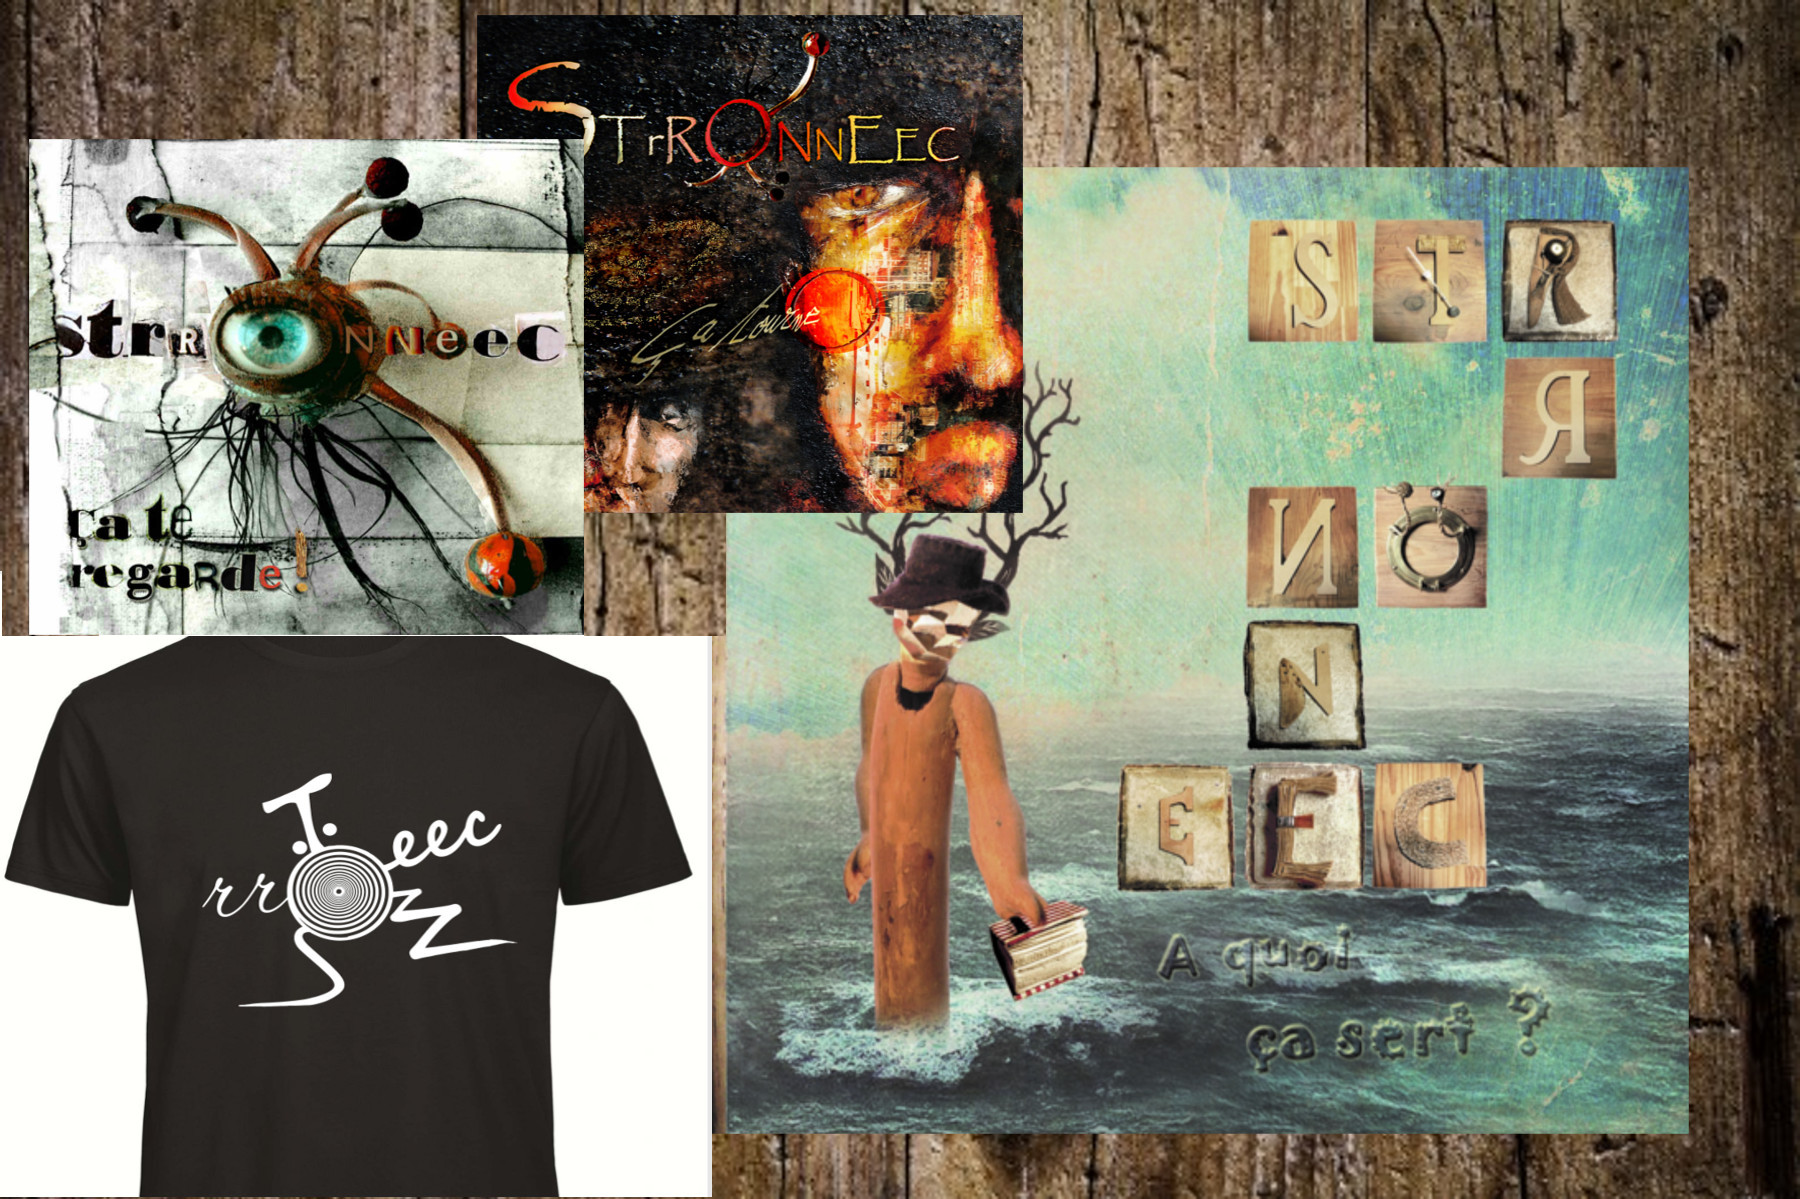 cd+_tee-shirt_+_anciens_cd_-1533519785.jpg